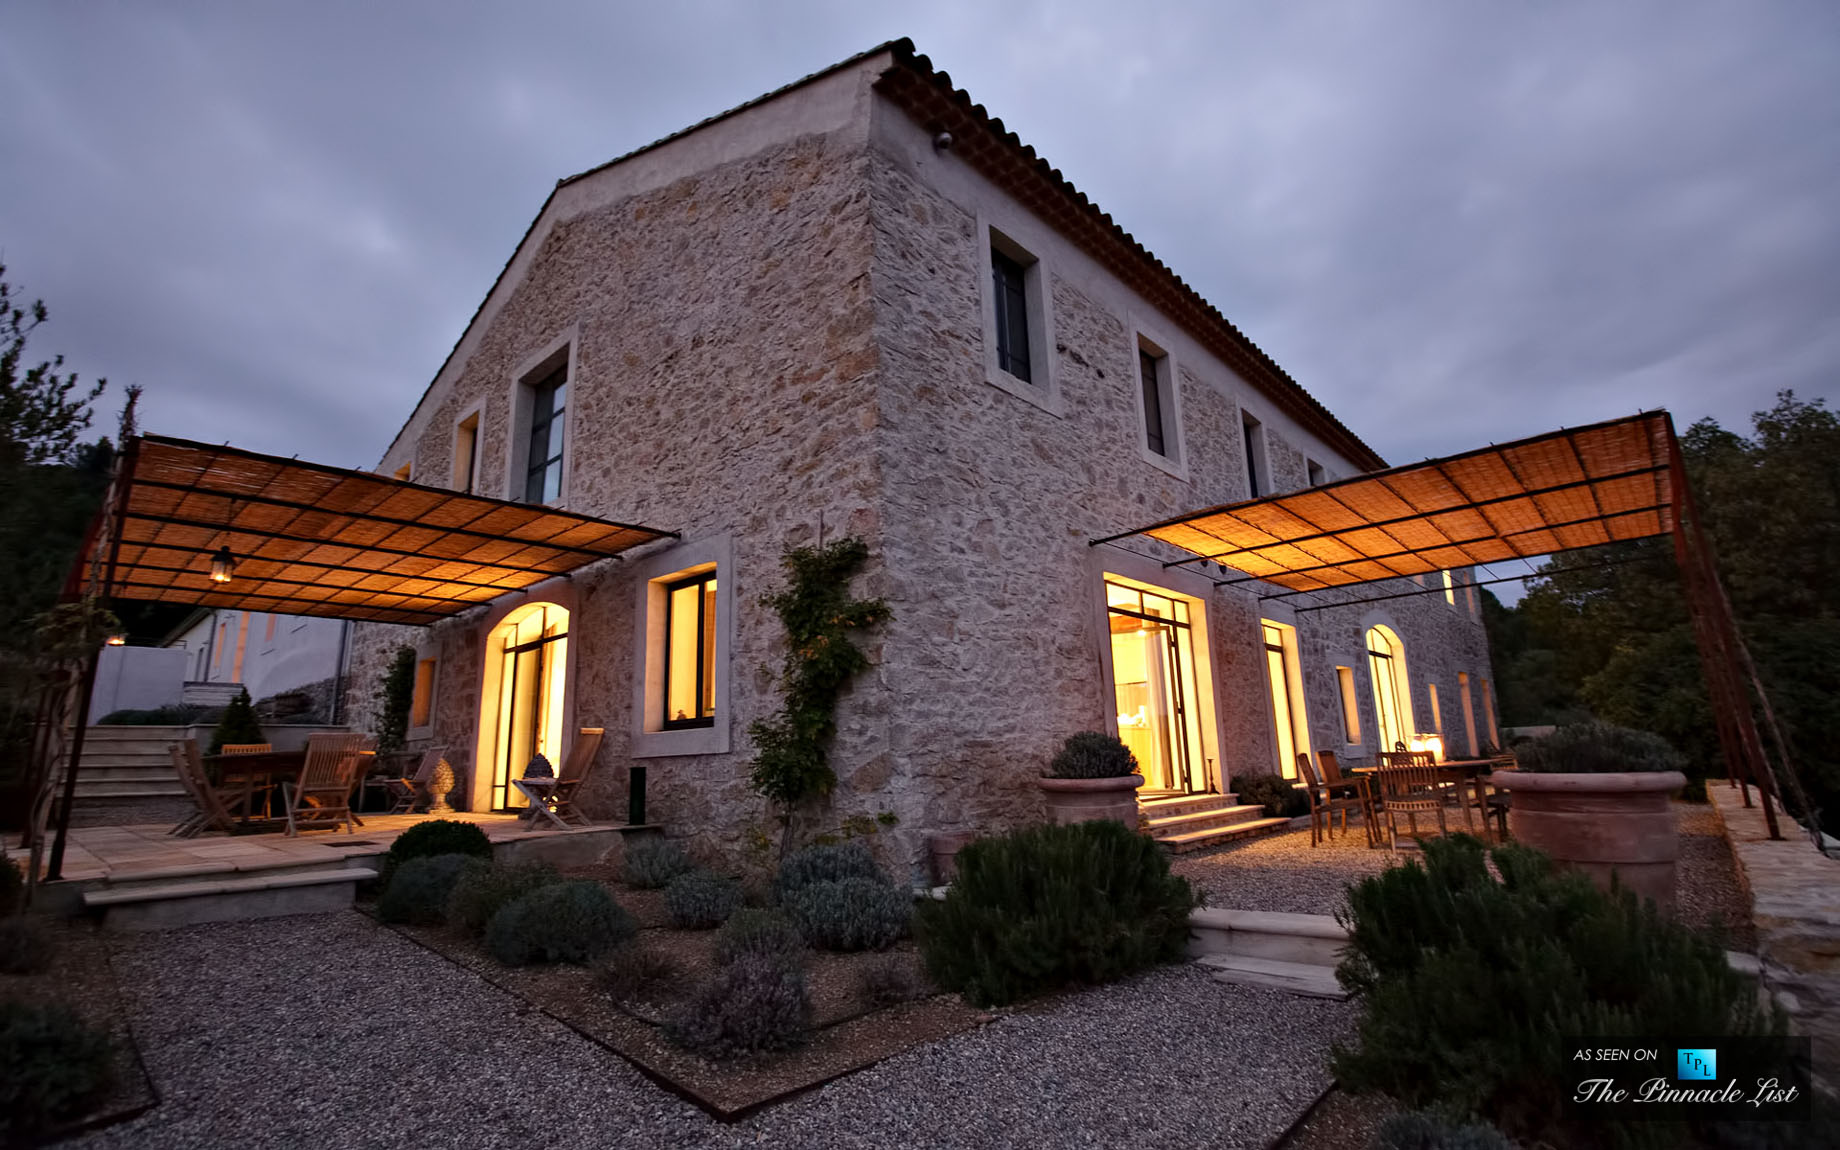 La Fraissinede Villa - Languedoc, France - The 5 Best Rural Villas in the Mediterranean for Luxury Retreats